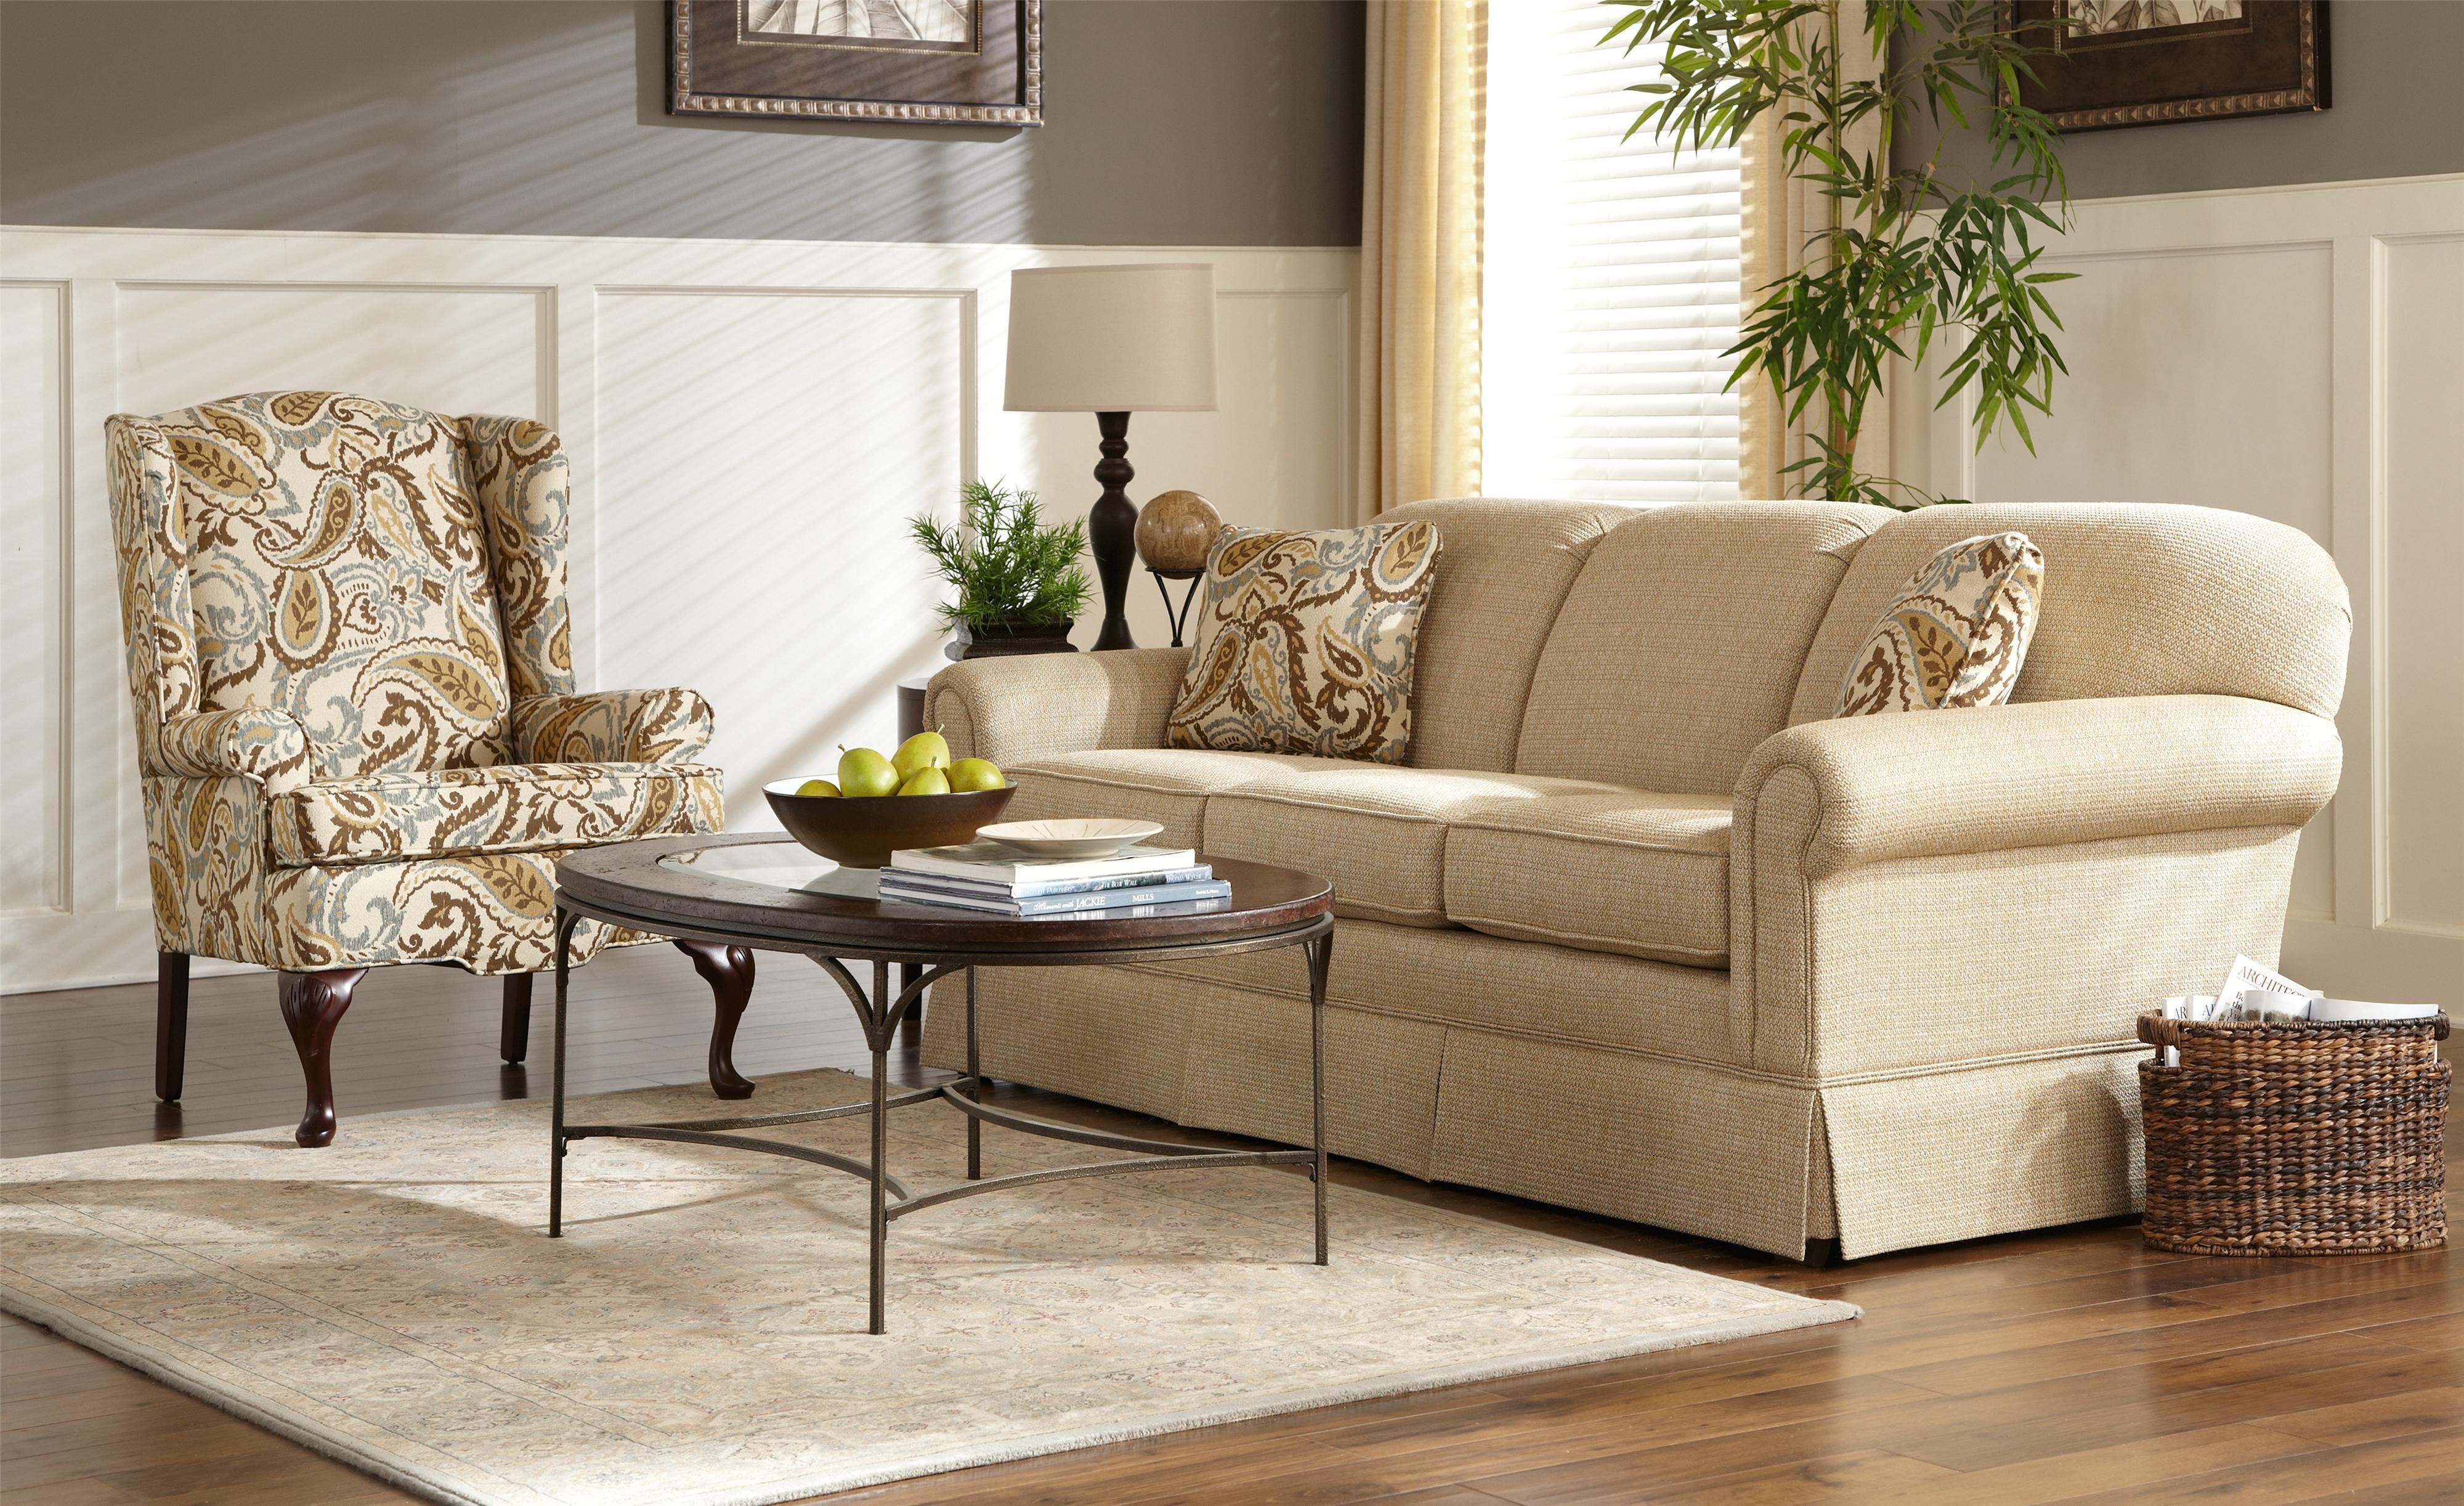 Craftmaster 4200 Stationary Living Room Group Olinde 39 S Furniture Stationary Living Room Groups